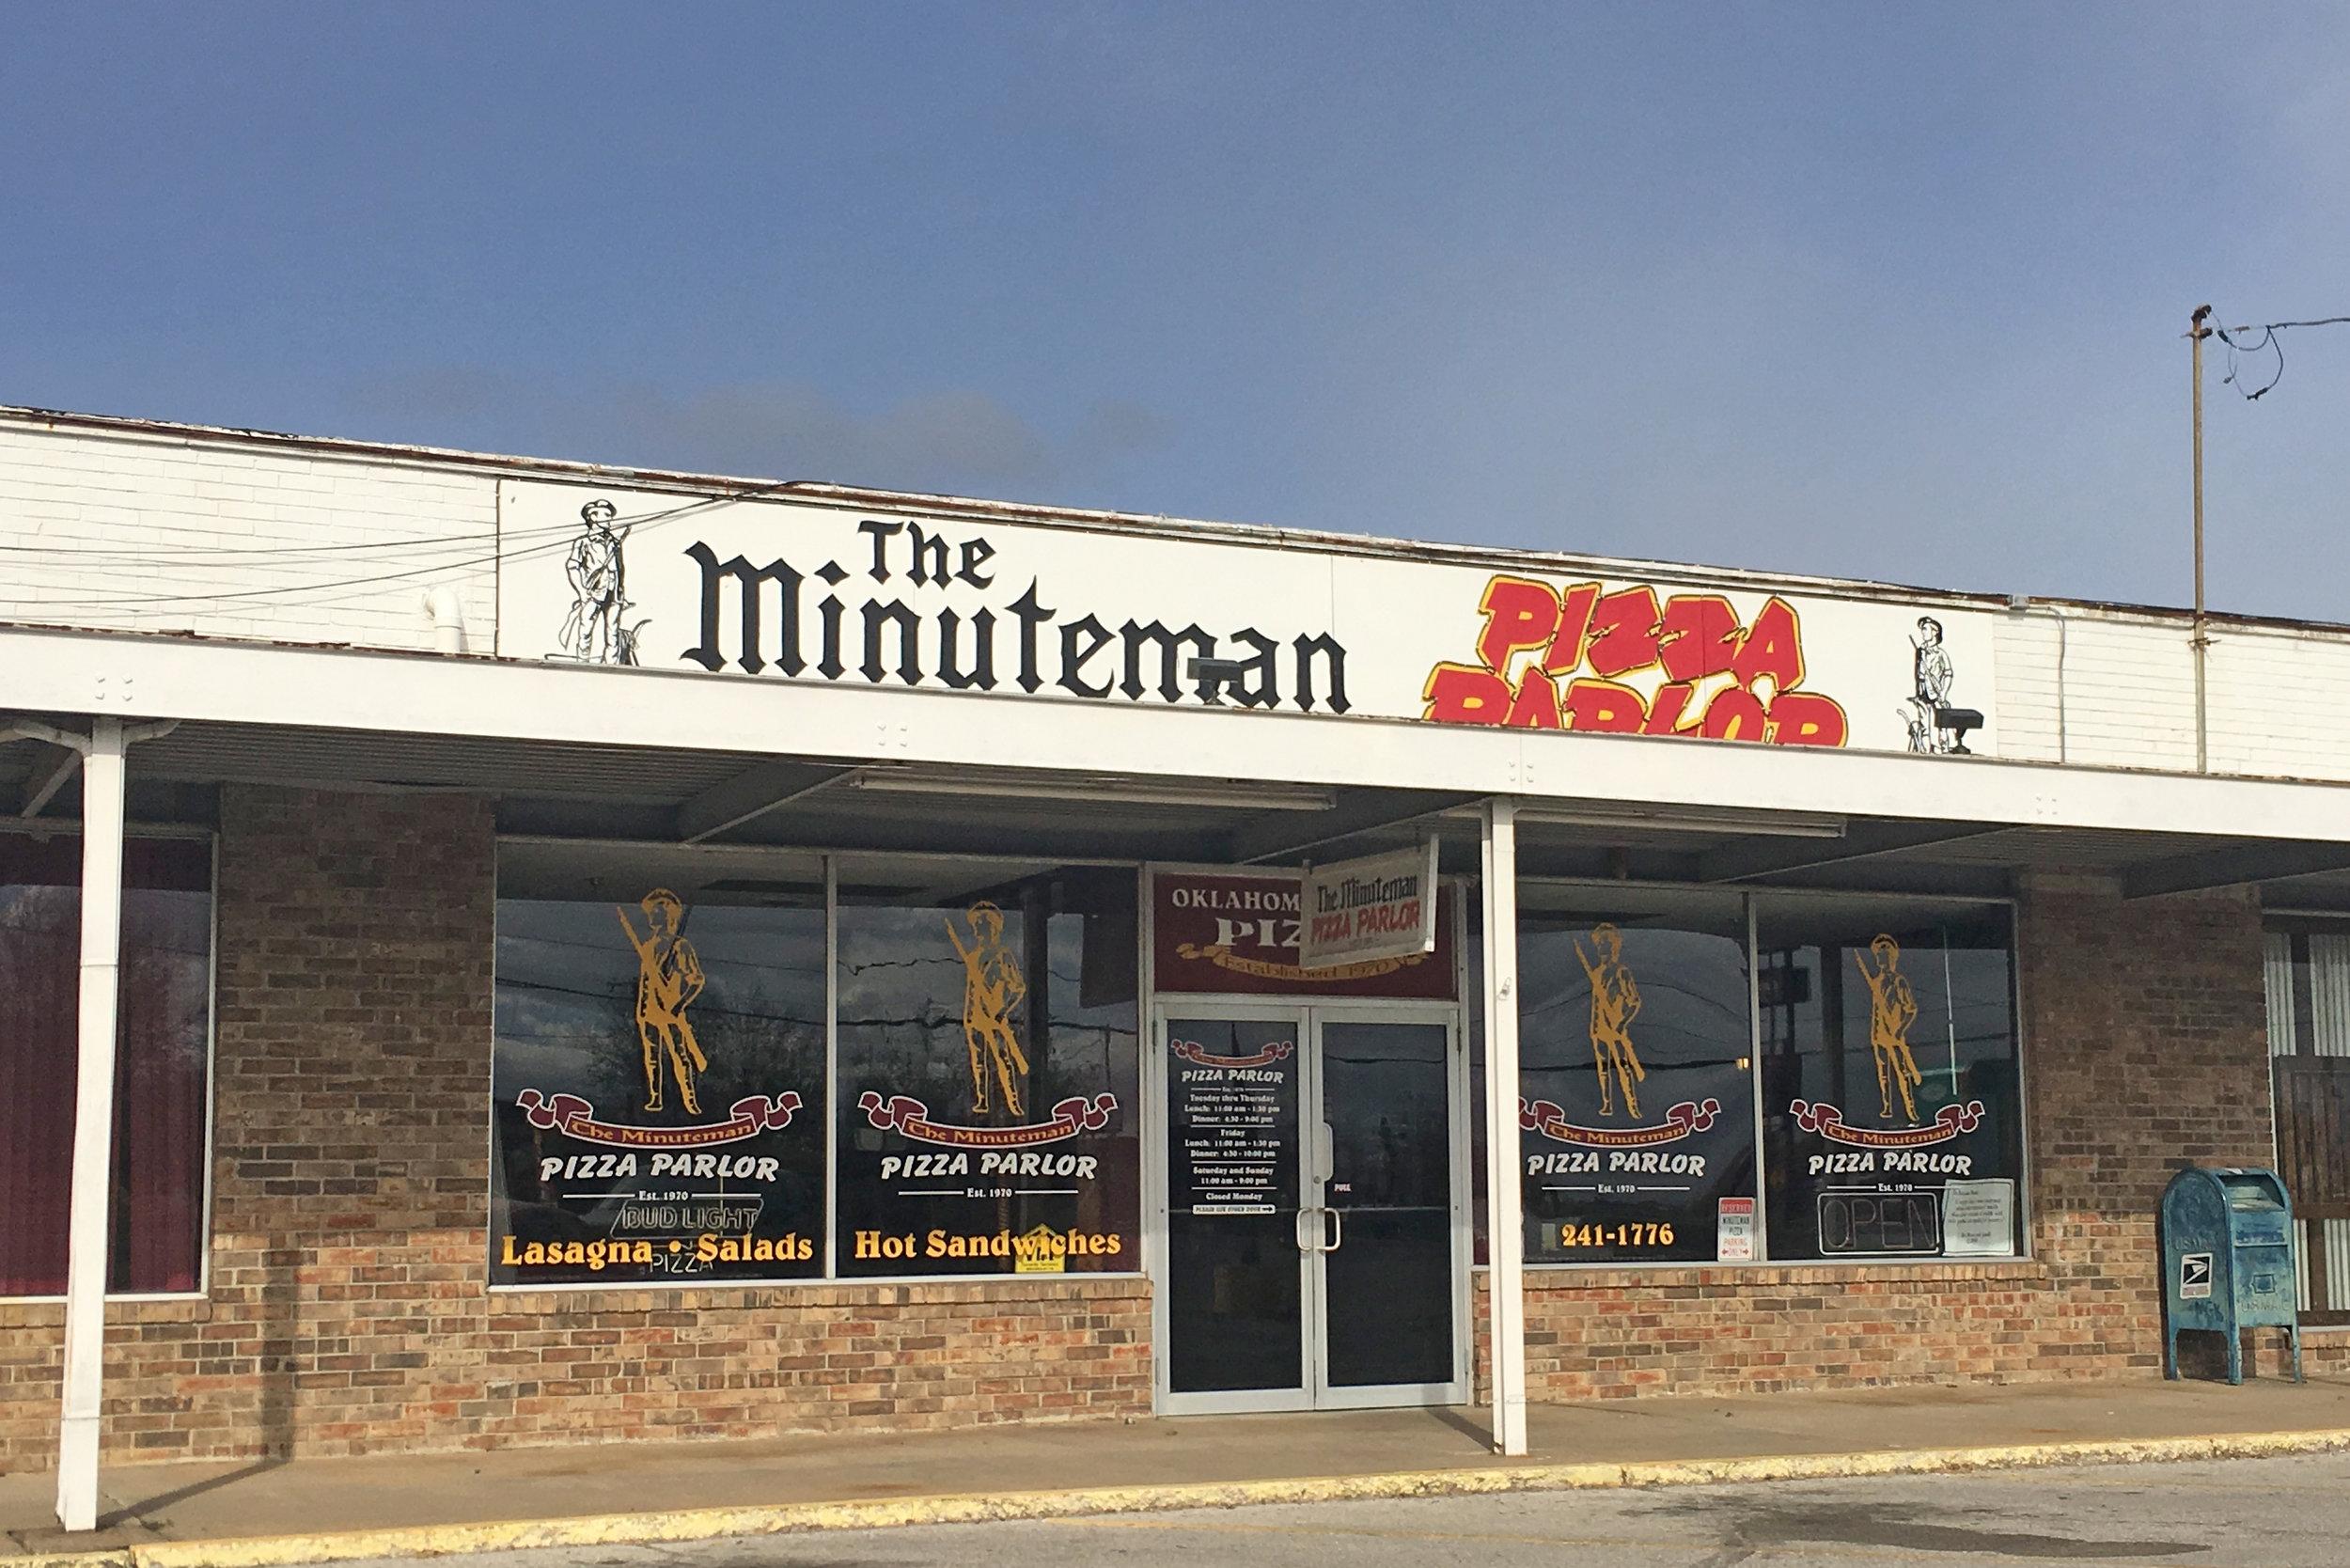 the minuteman pizza parlor - prattville center 7 west 41st street